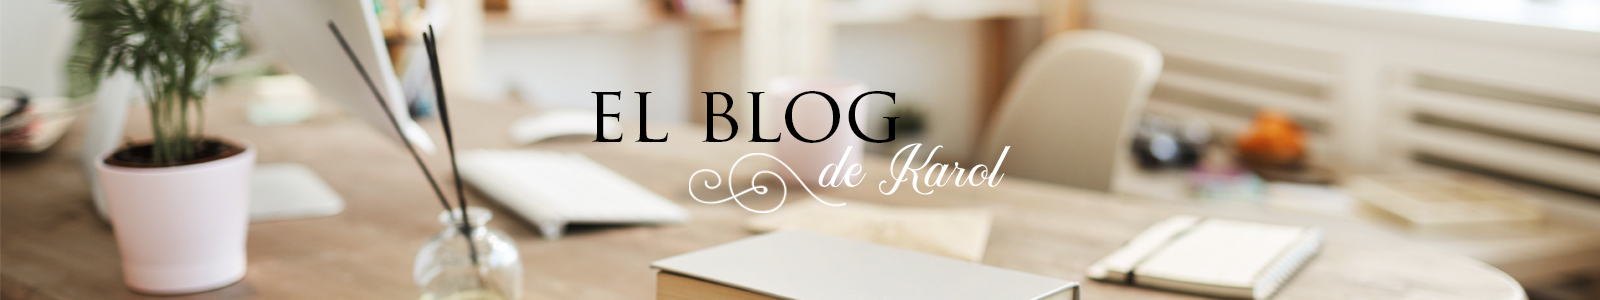 blog de casika, donde encontrarás infinidad de ideas sobre decoración